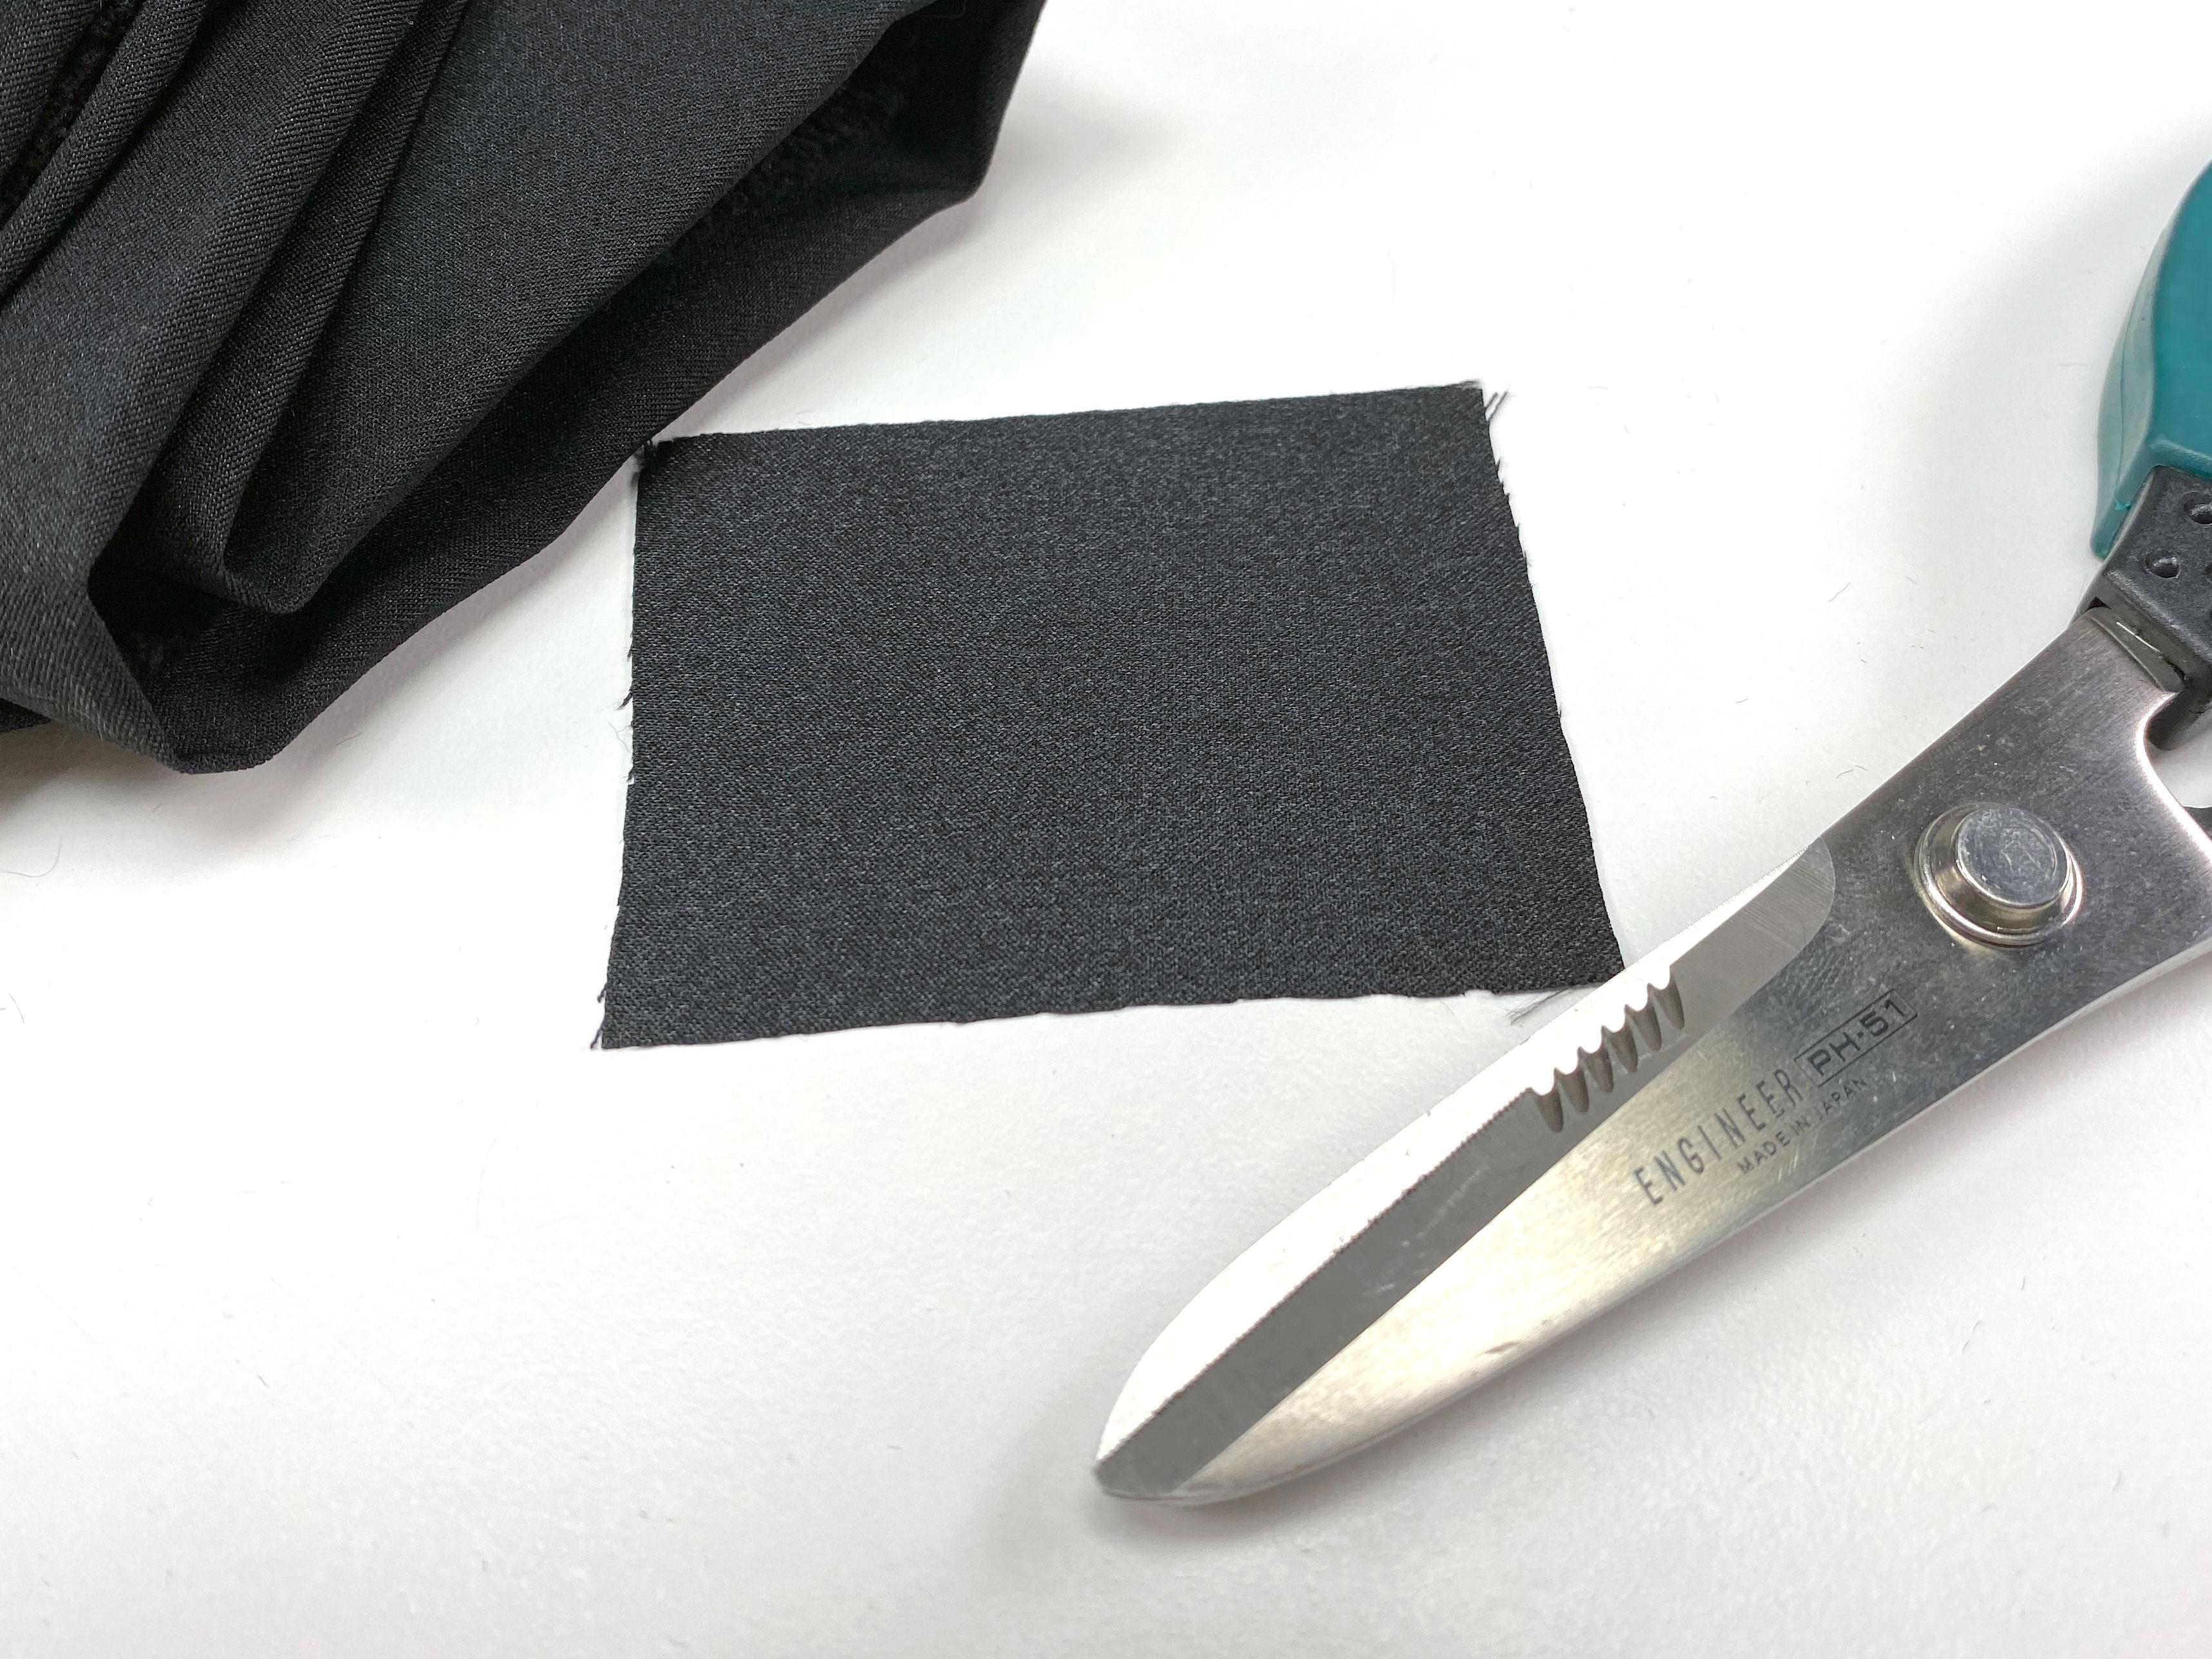 led_strips_pocket-fabric-4to3.jpg